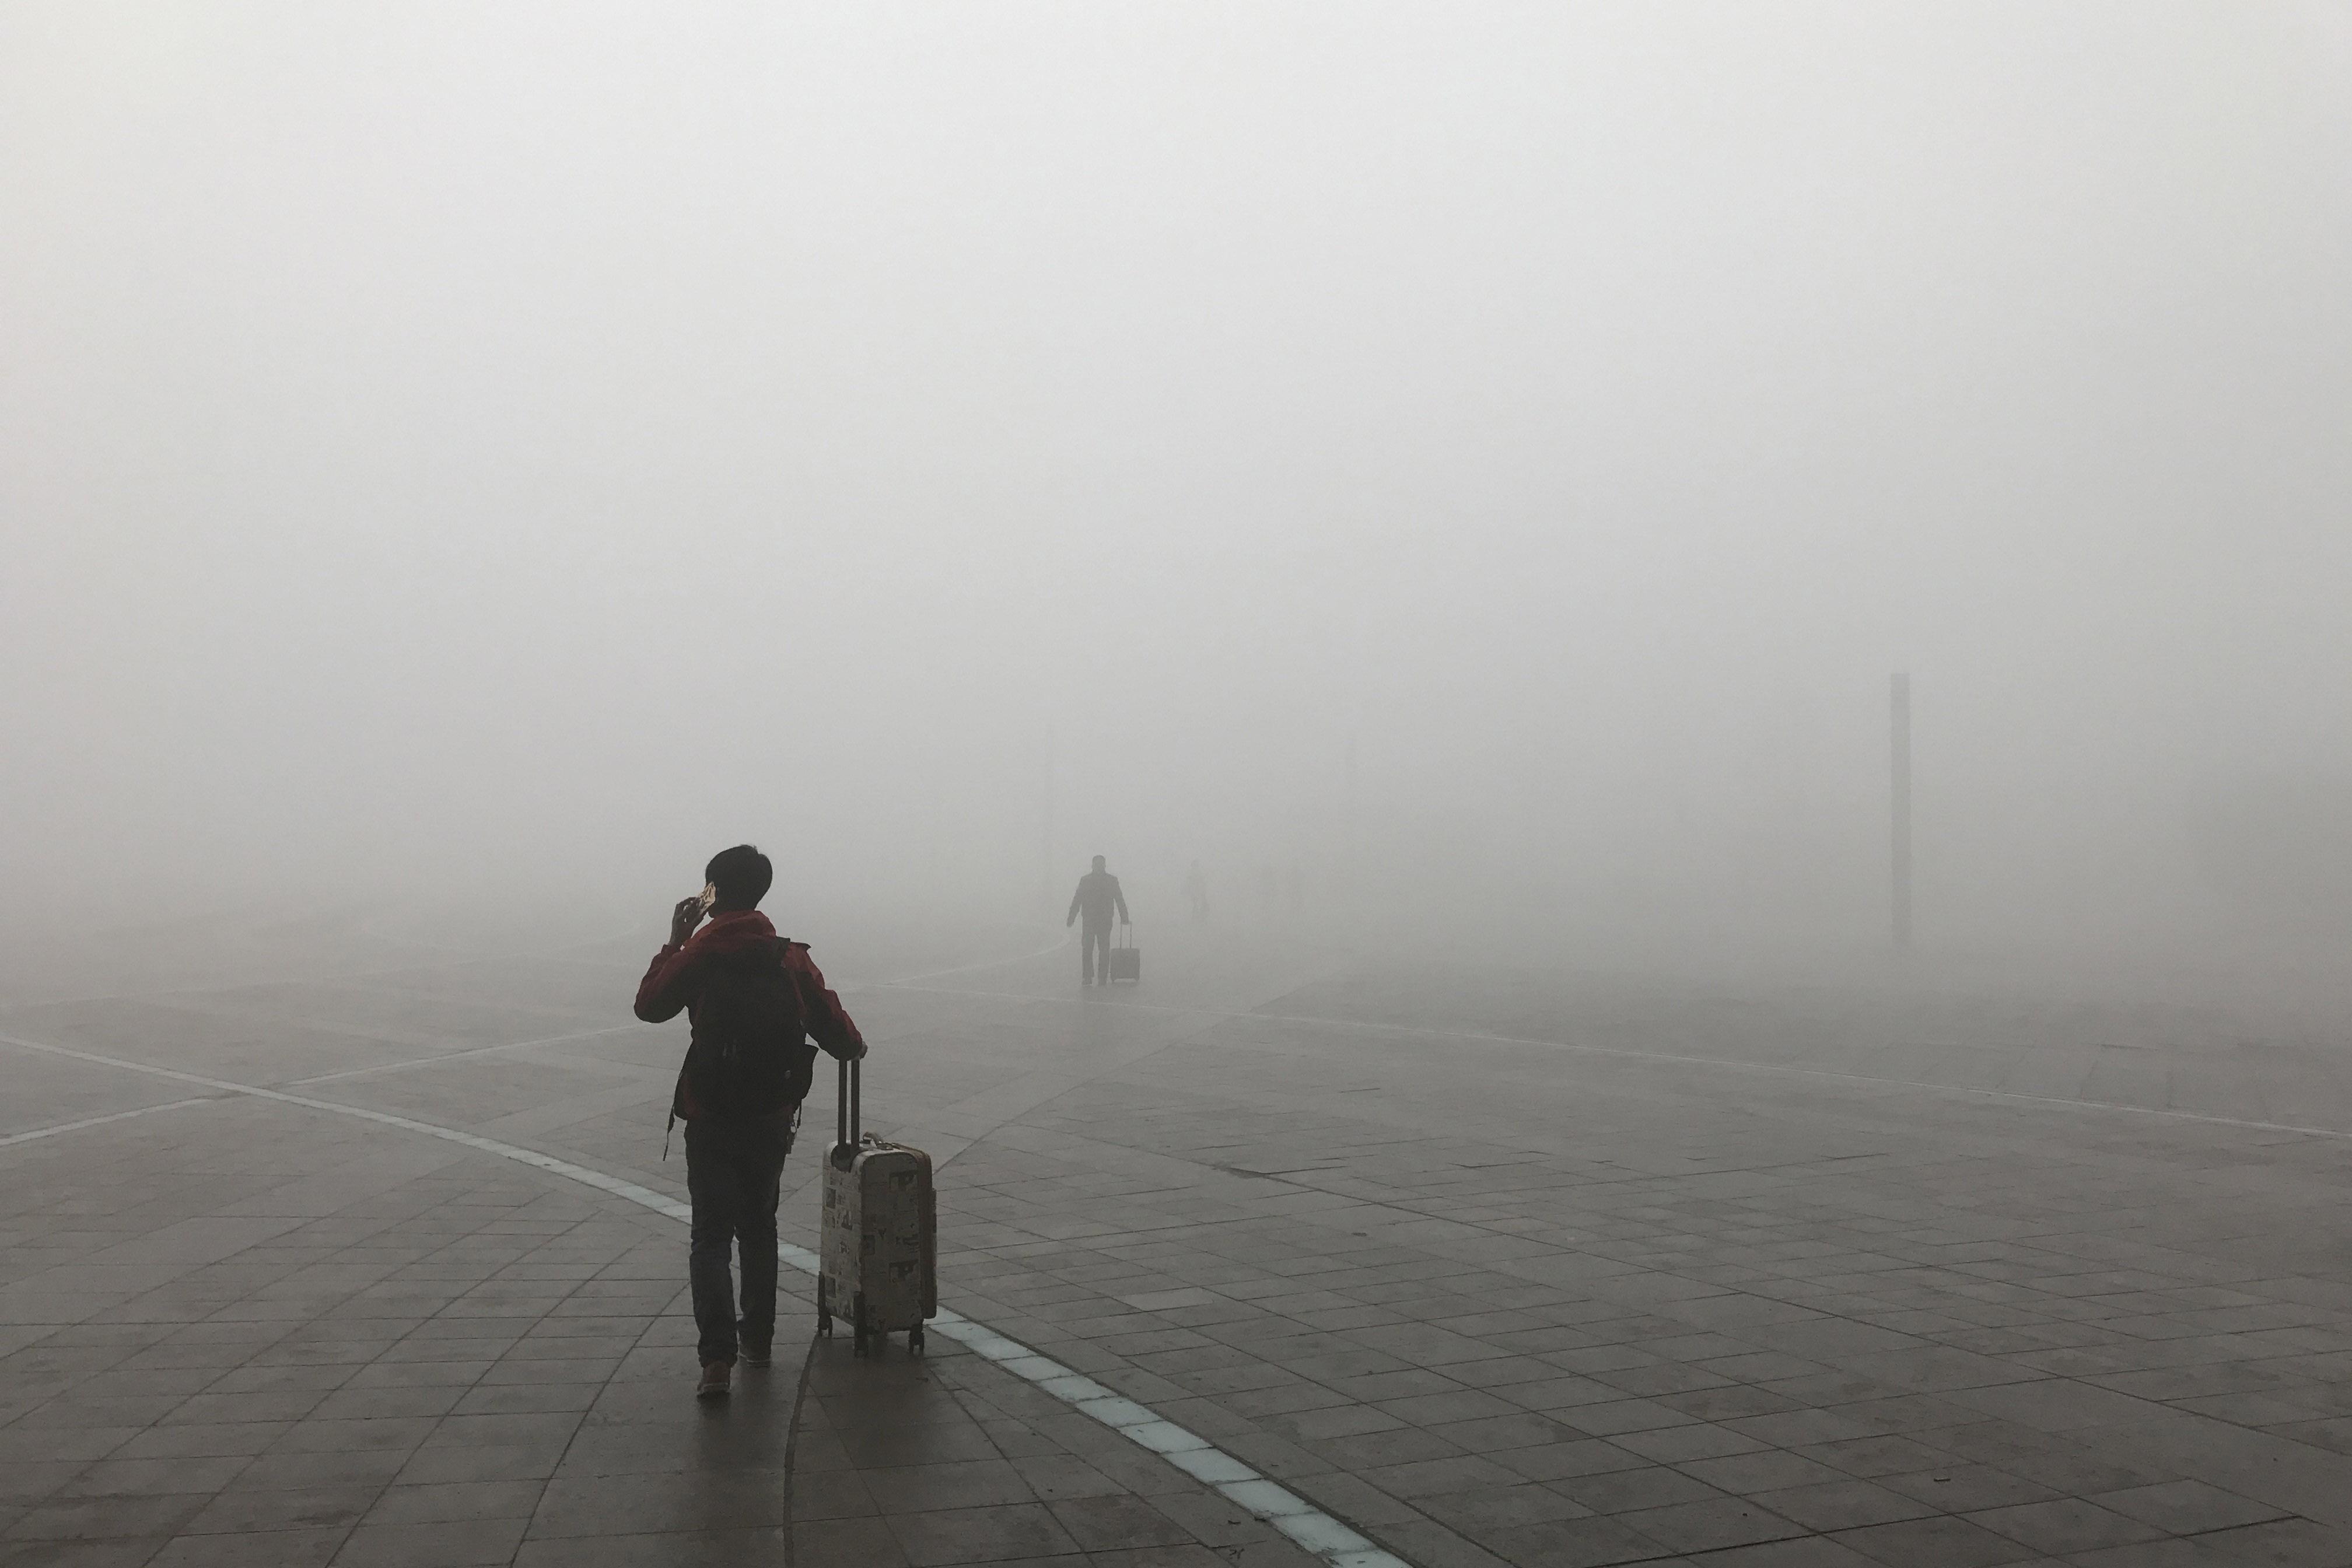 Passengers walk in the smog at Zhengzhou East Railway Station on Jan. 9, 2017, in Zhengzhou, Henan province, China